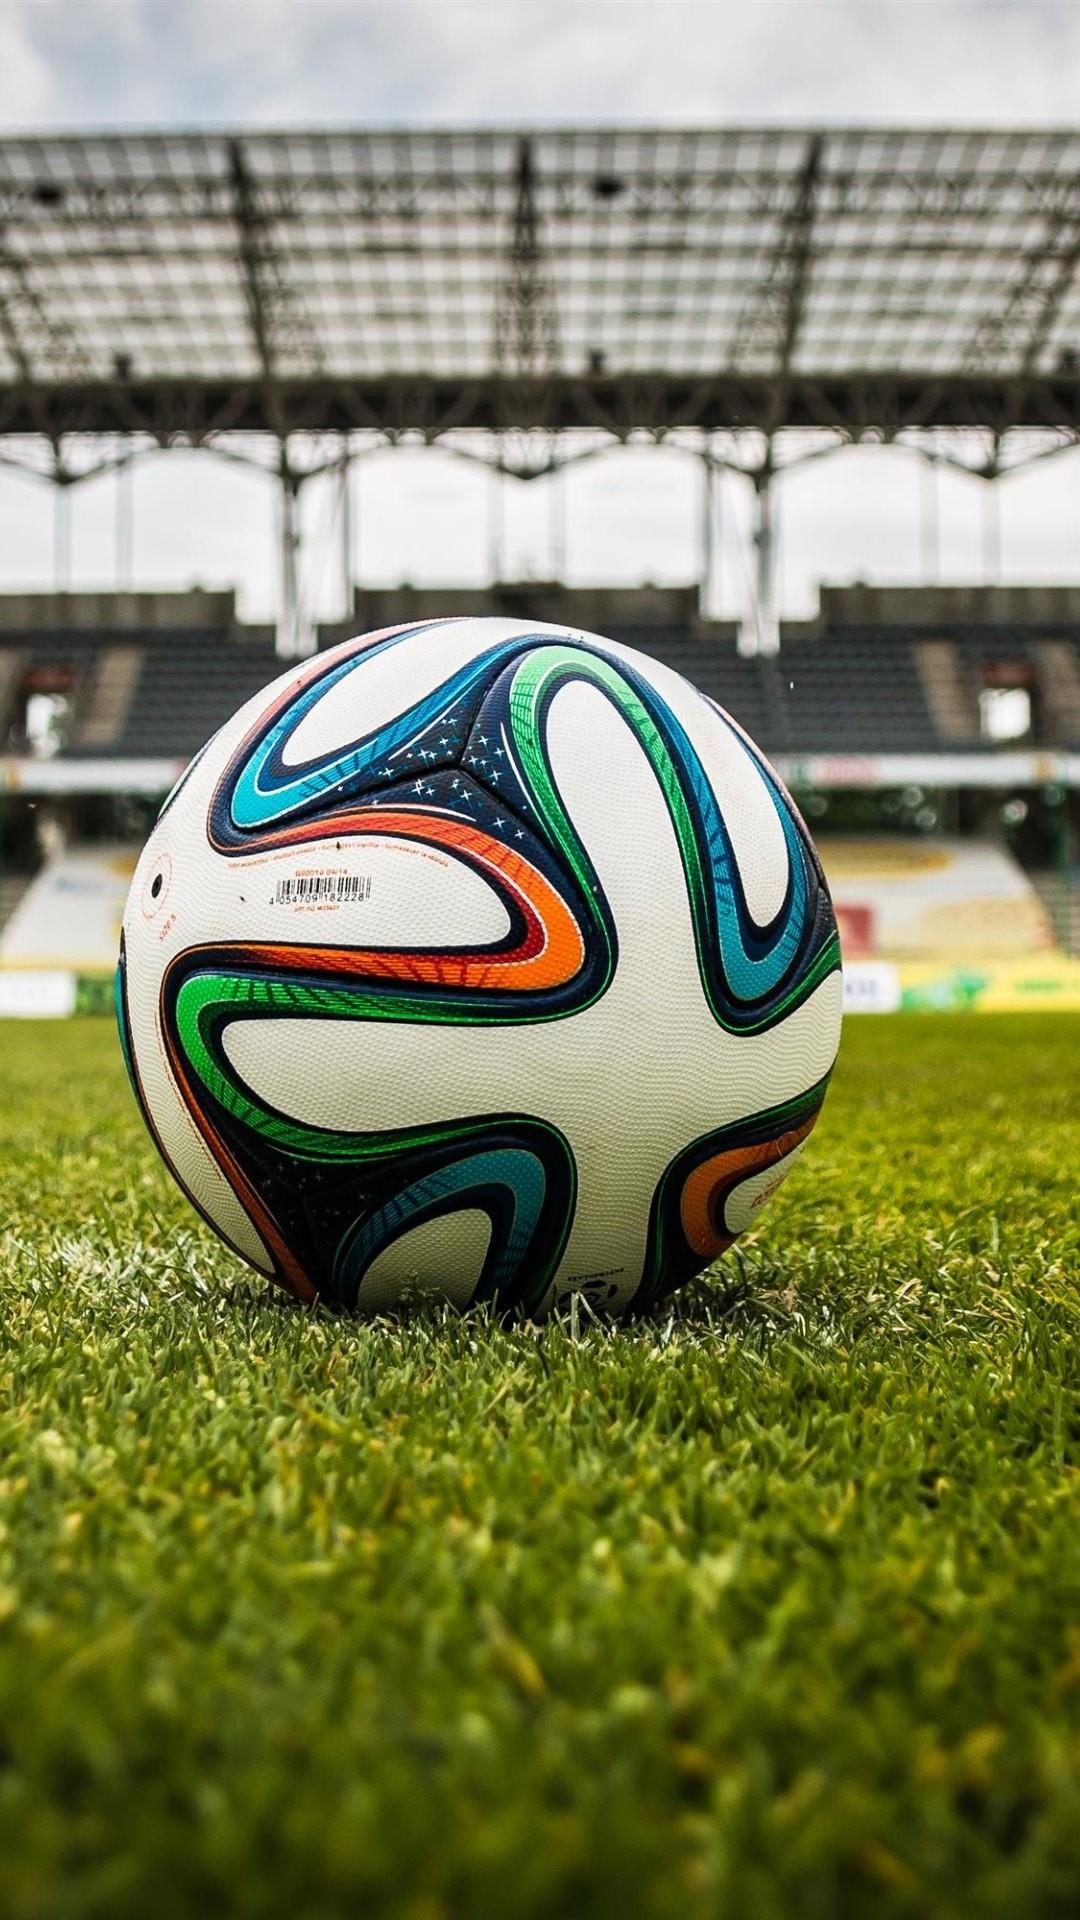 Iphone Wallpaper Soccer